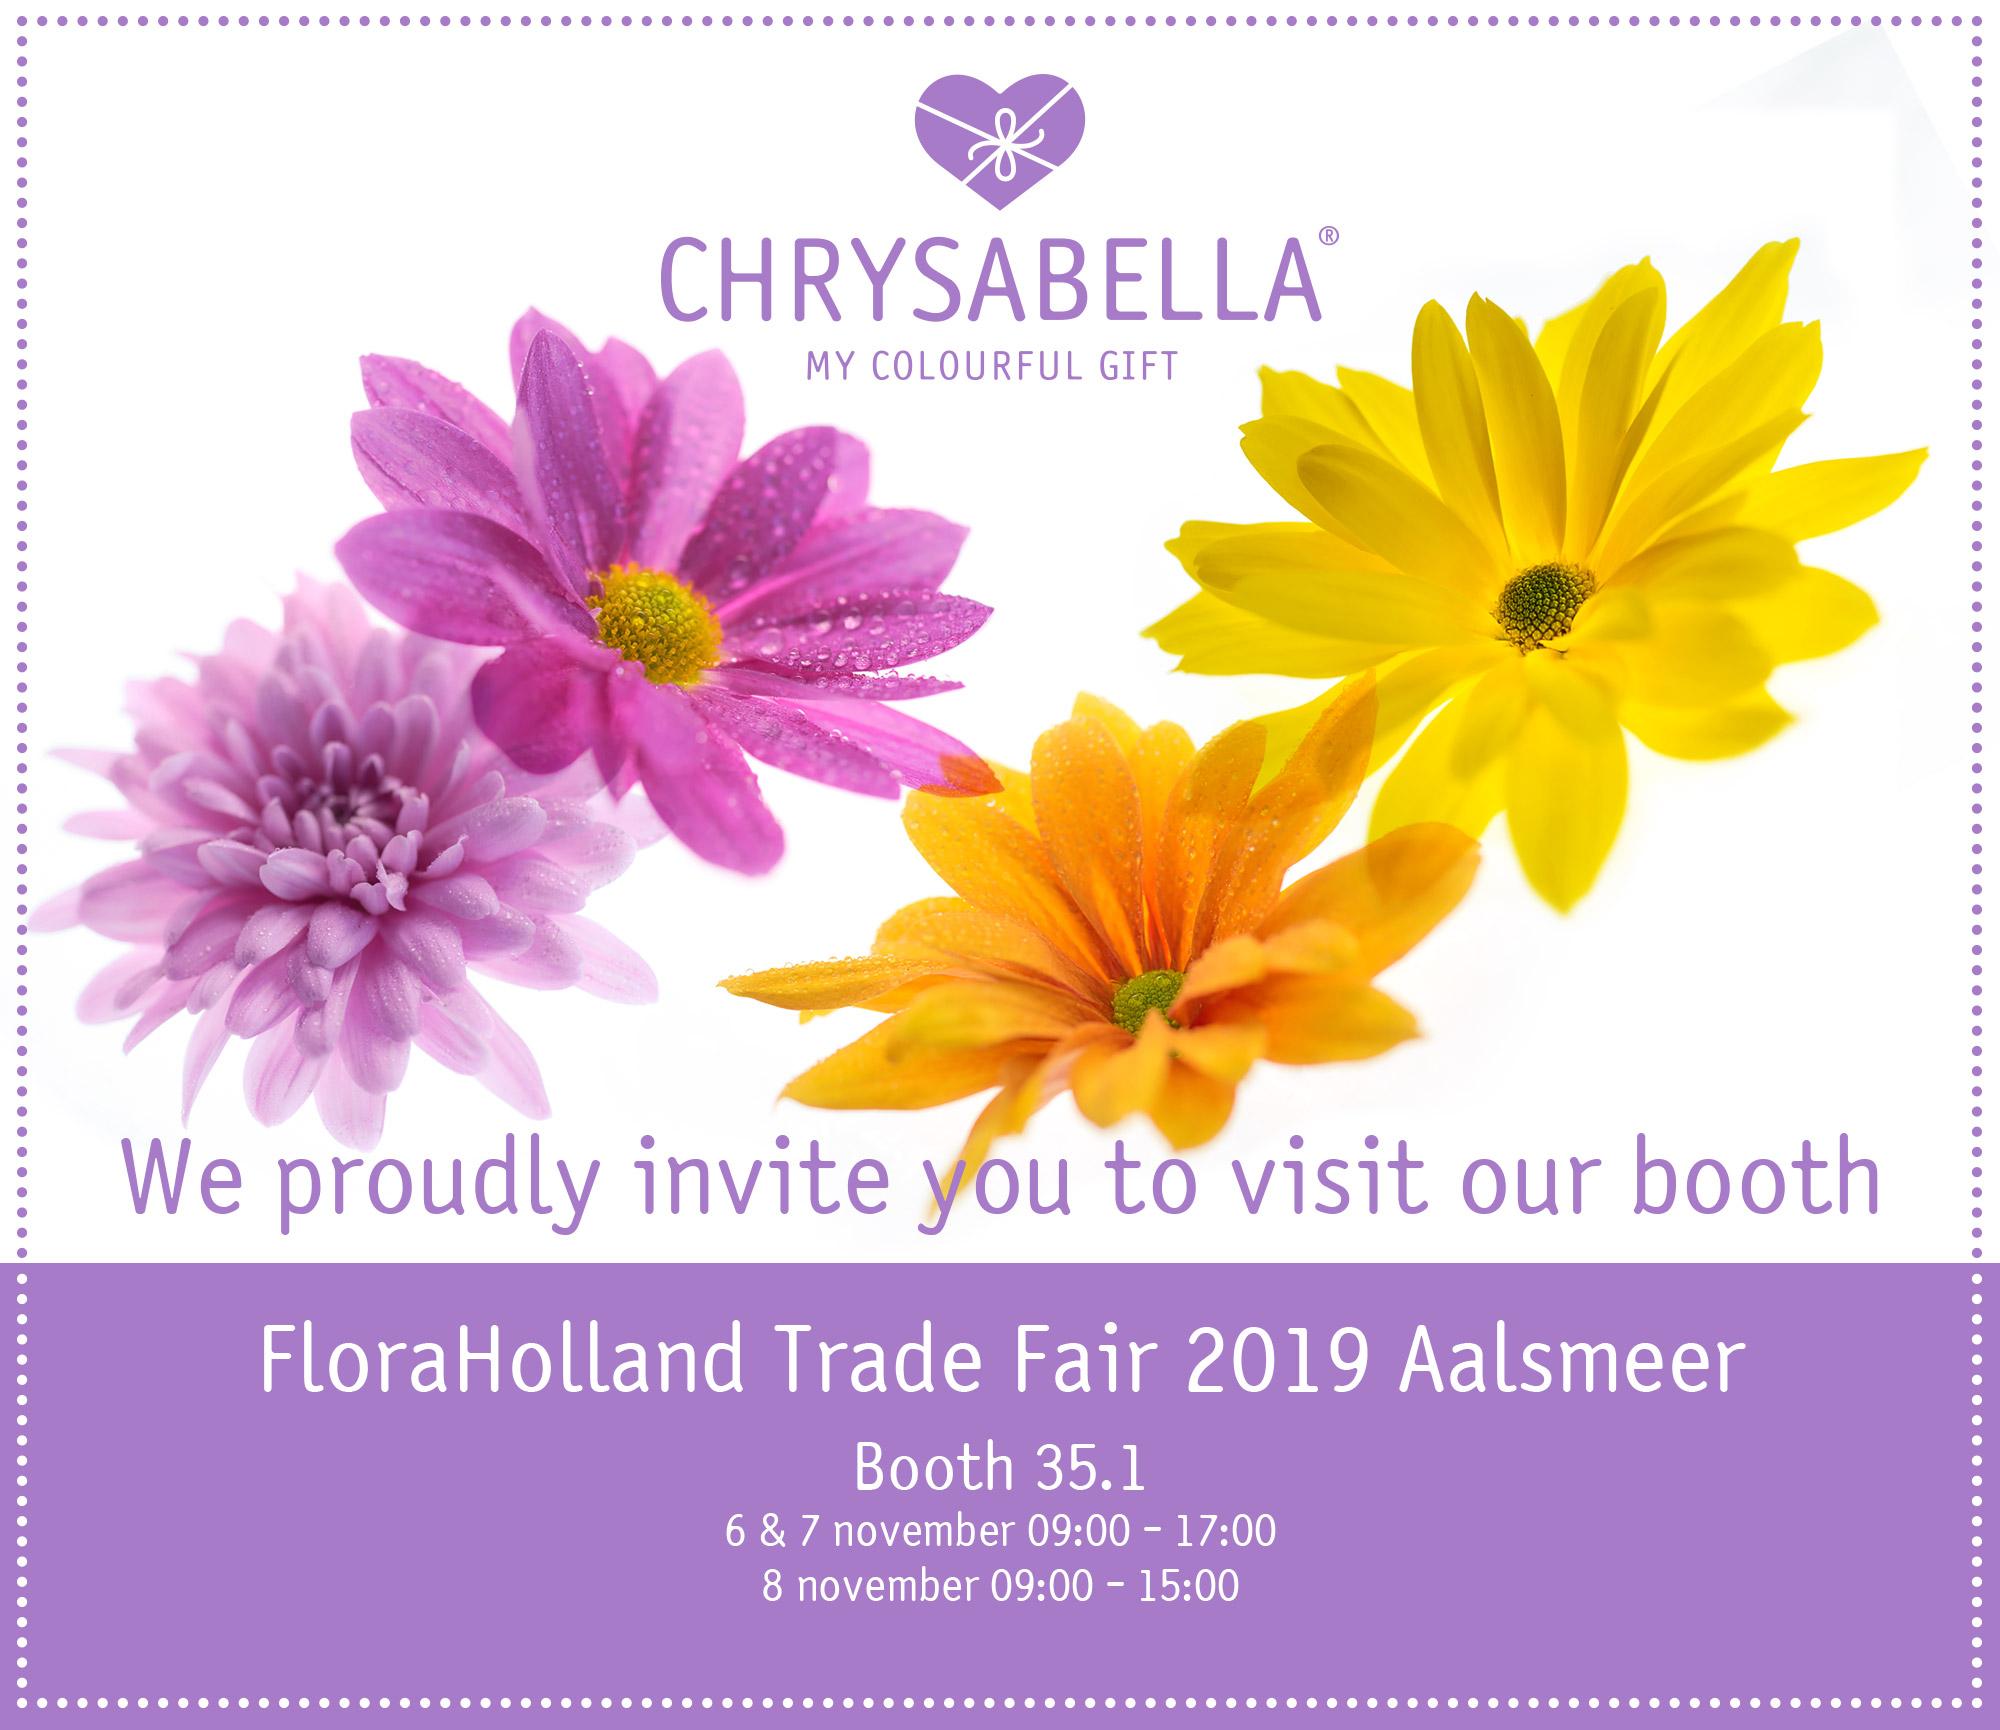 berkhout chrysabella FloraHolland Trade Fair 2019